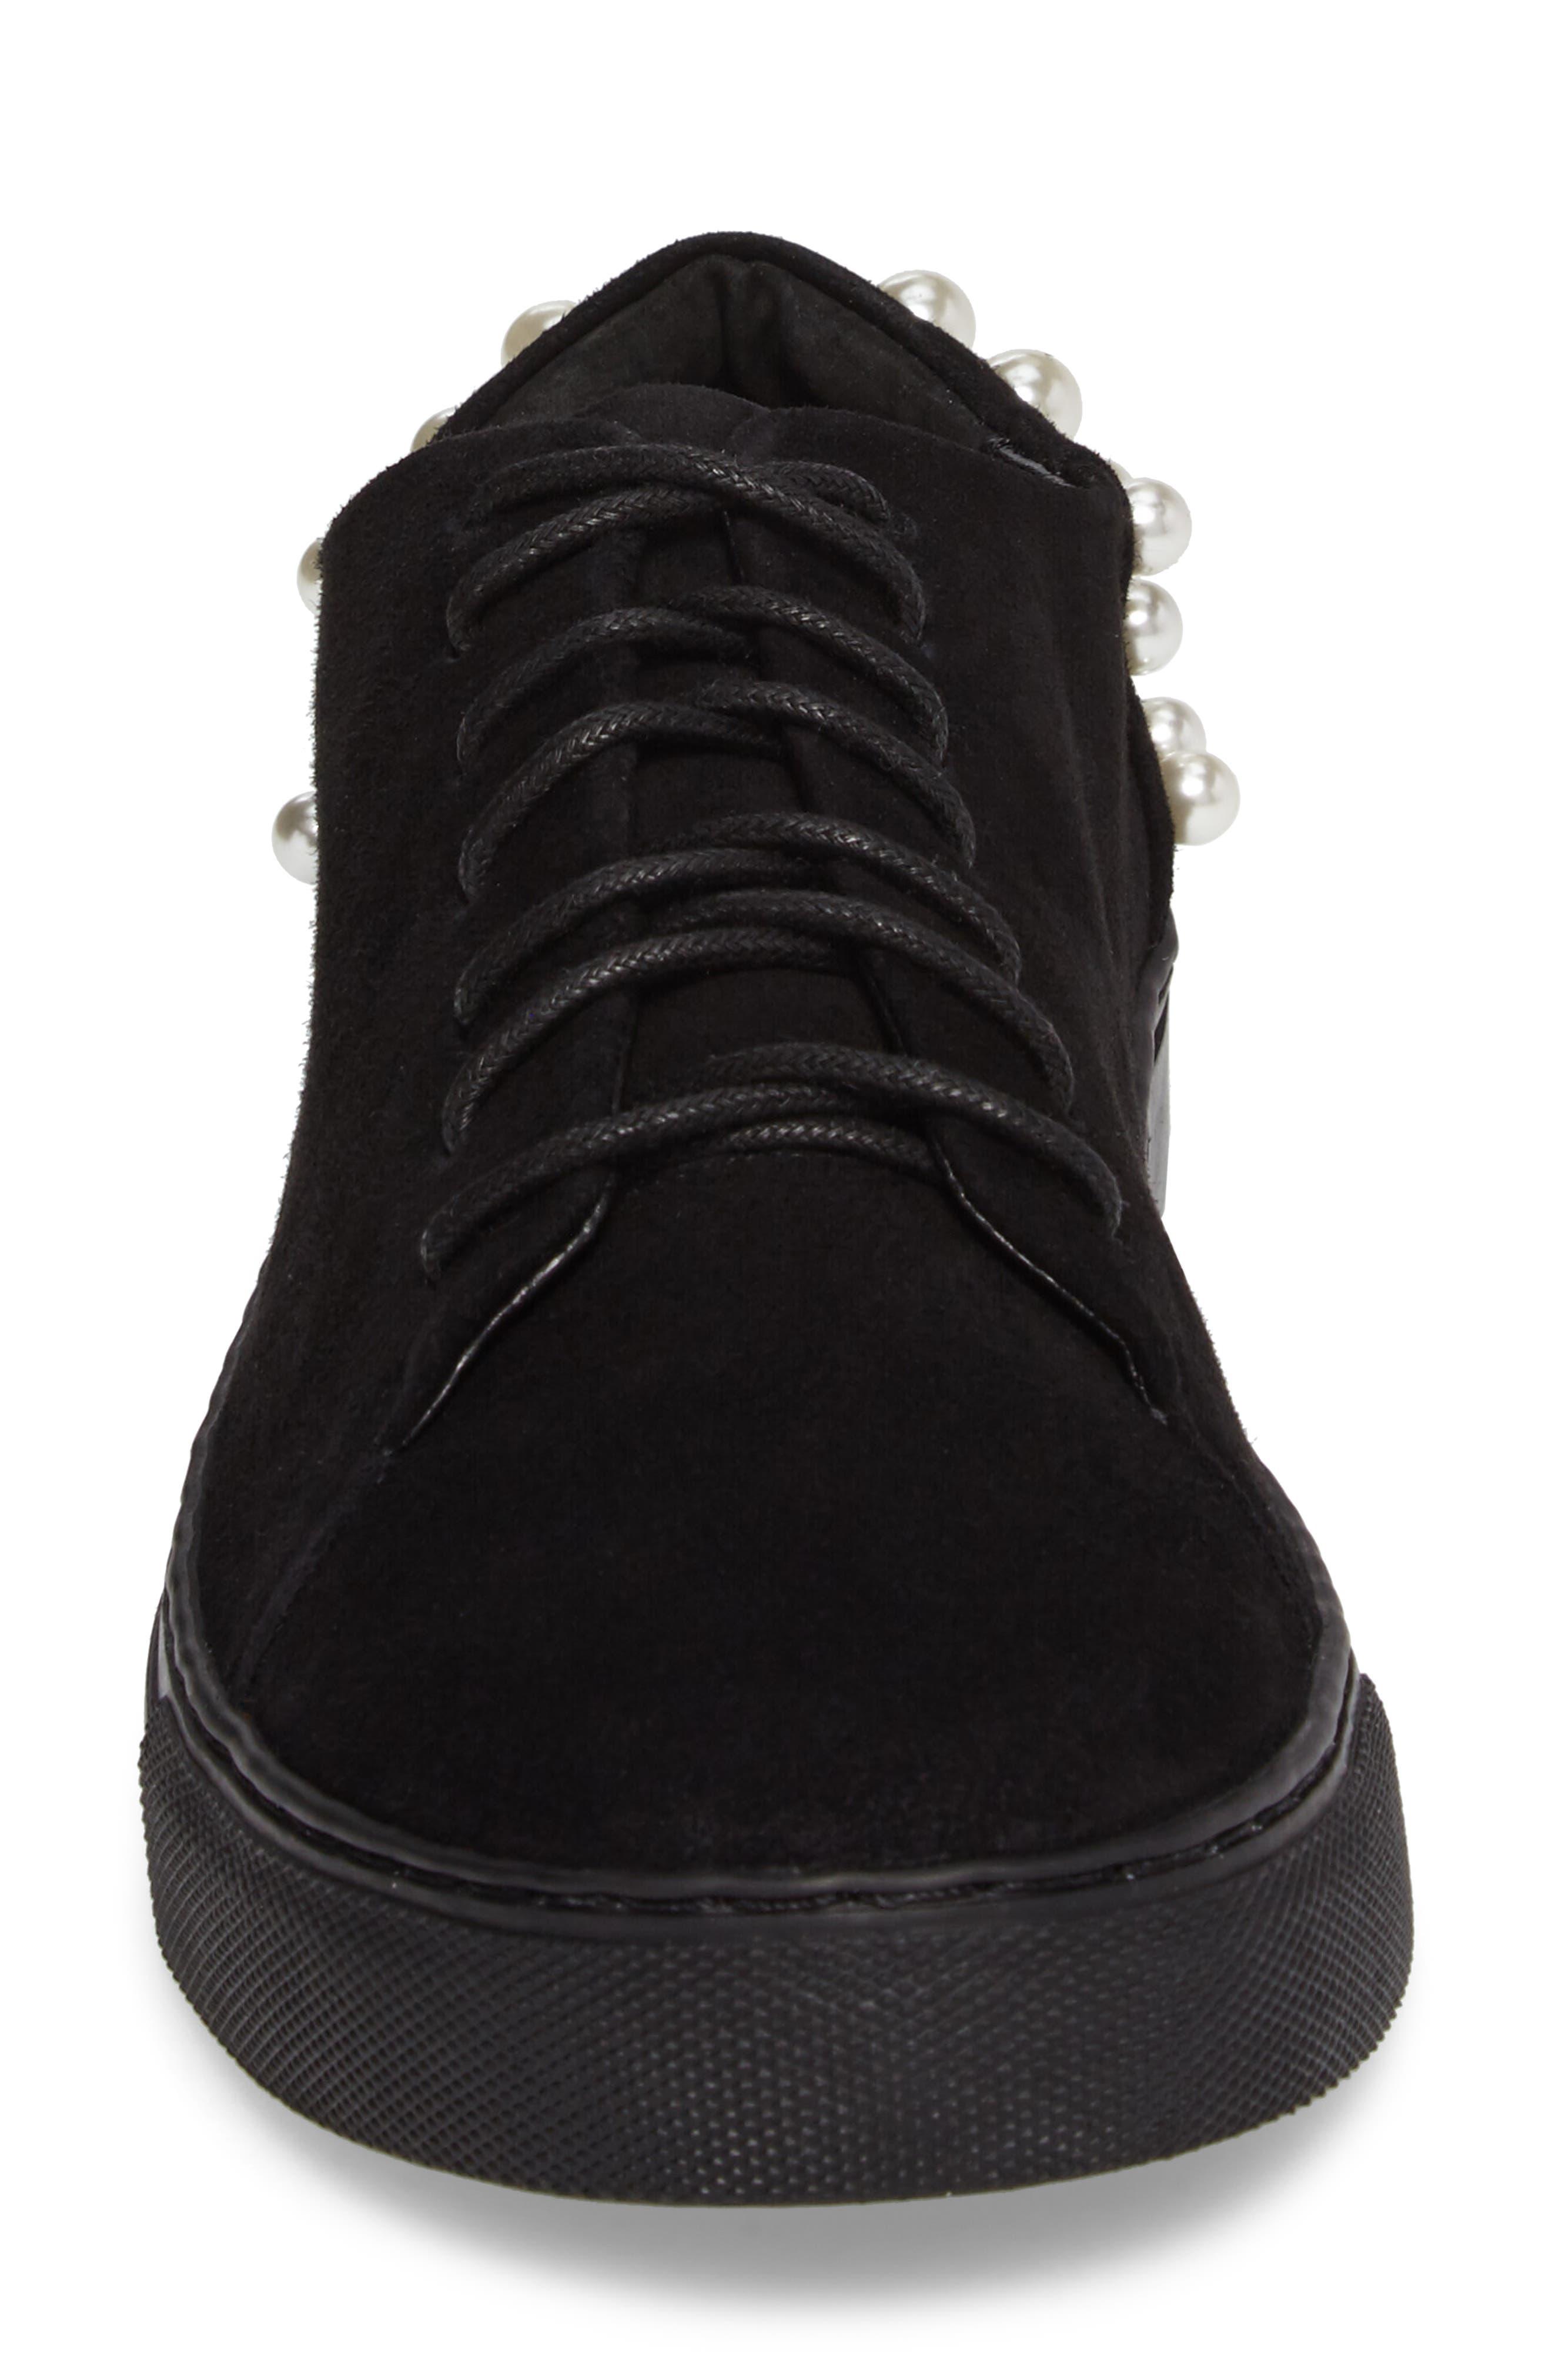 Haig Embellished Sneaker,                             Alternate thumbnail 4, color,                             001